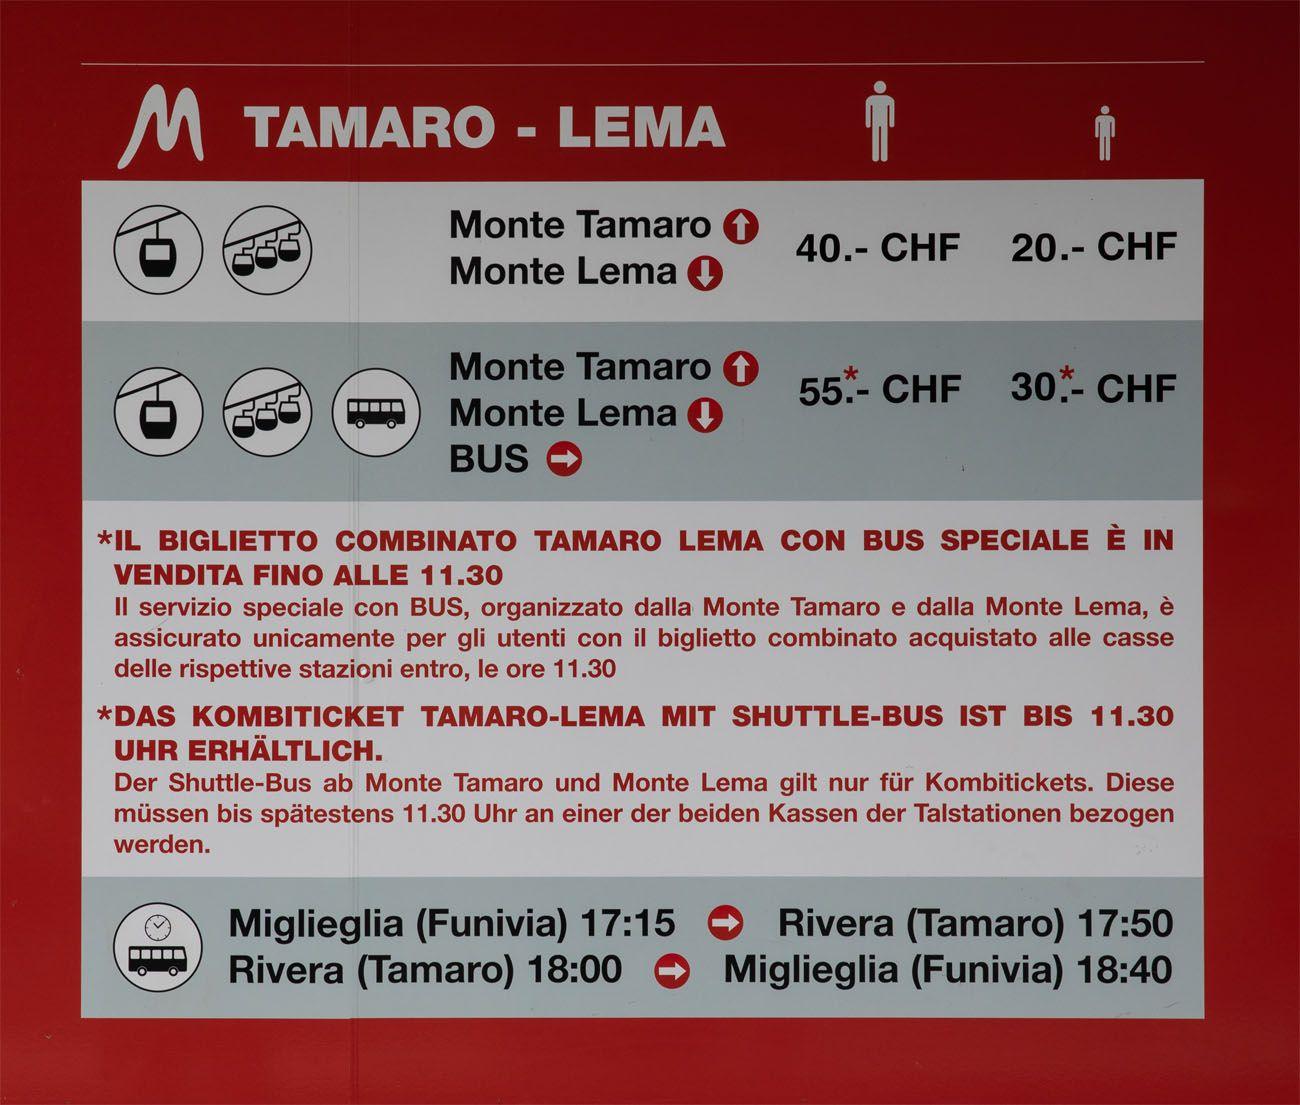 Tamaro Lema Shuttle Bus